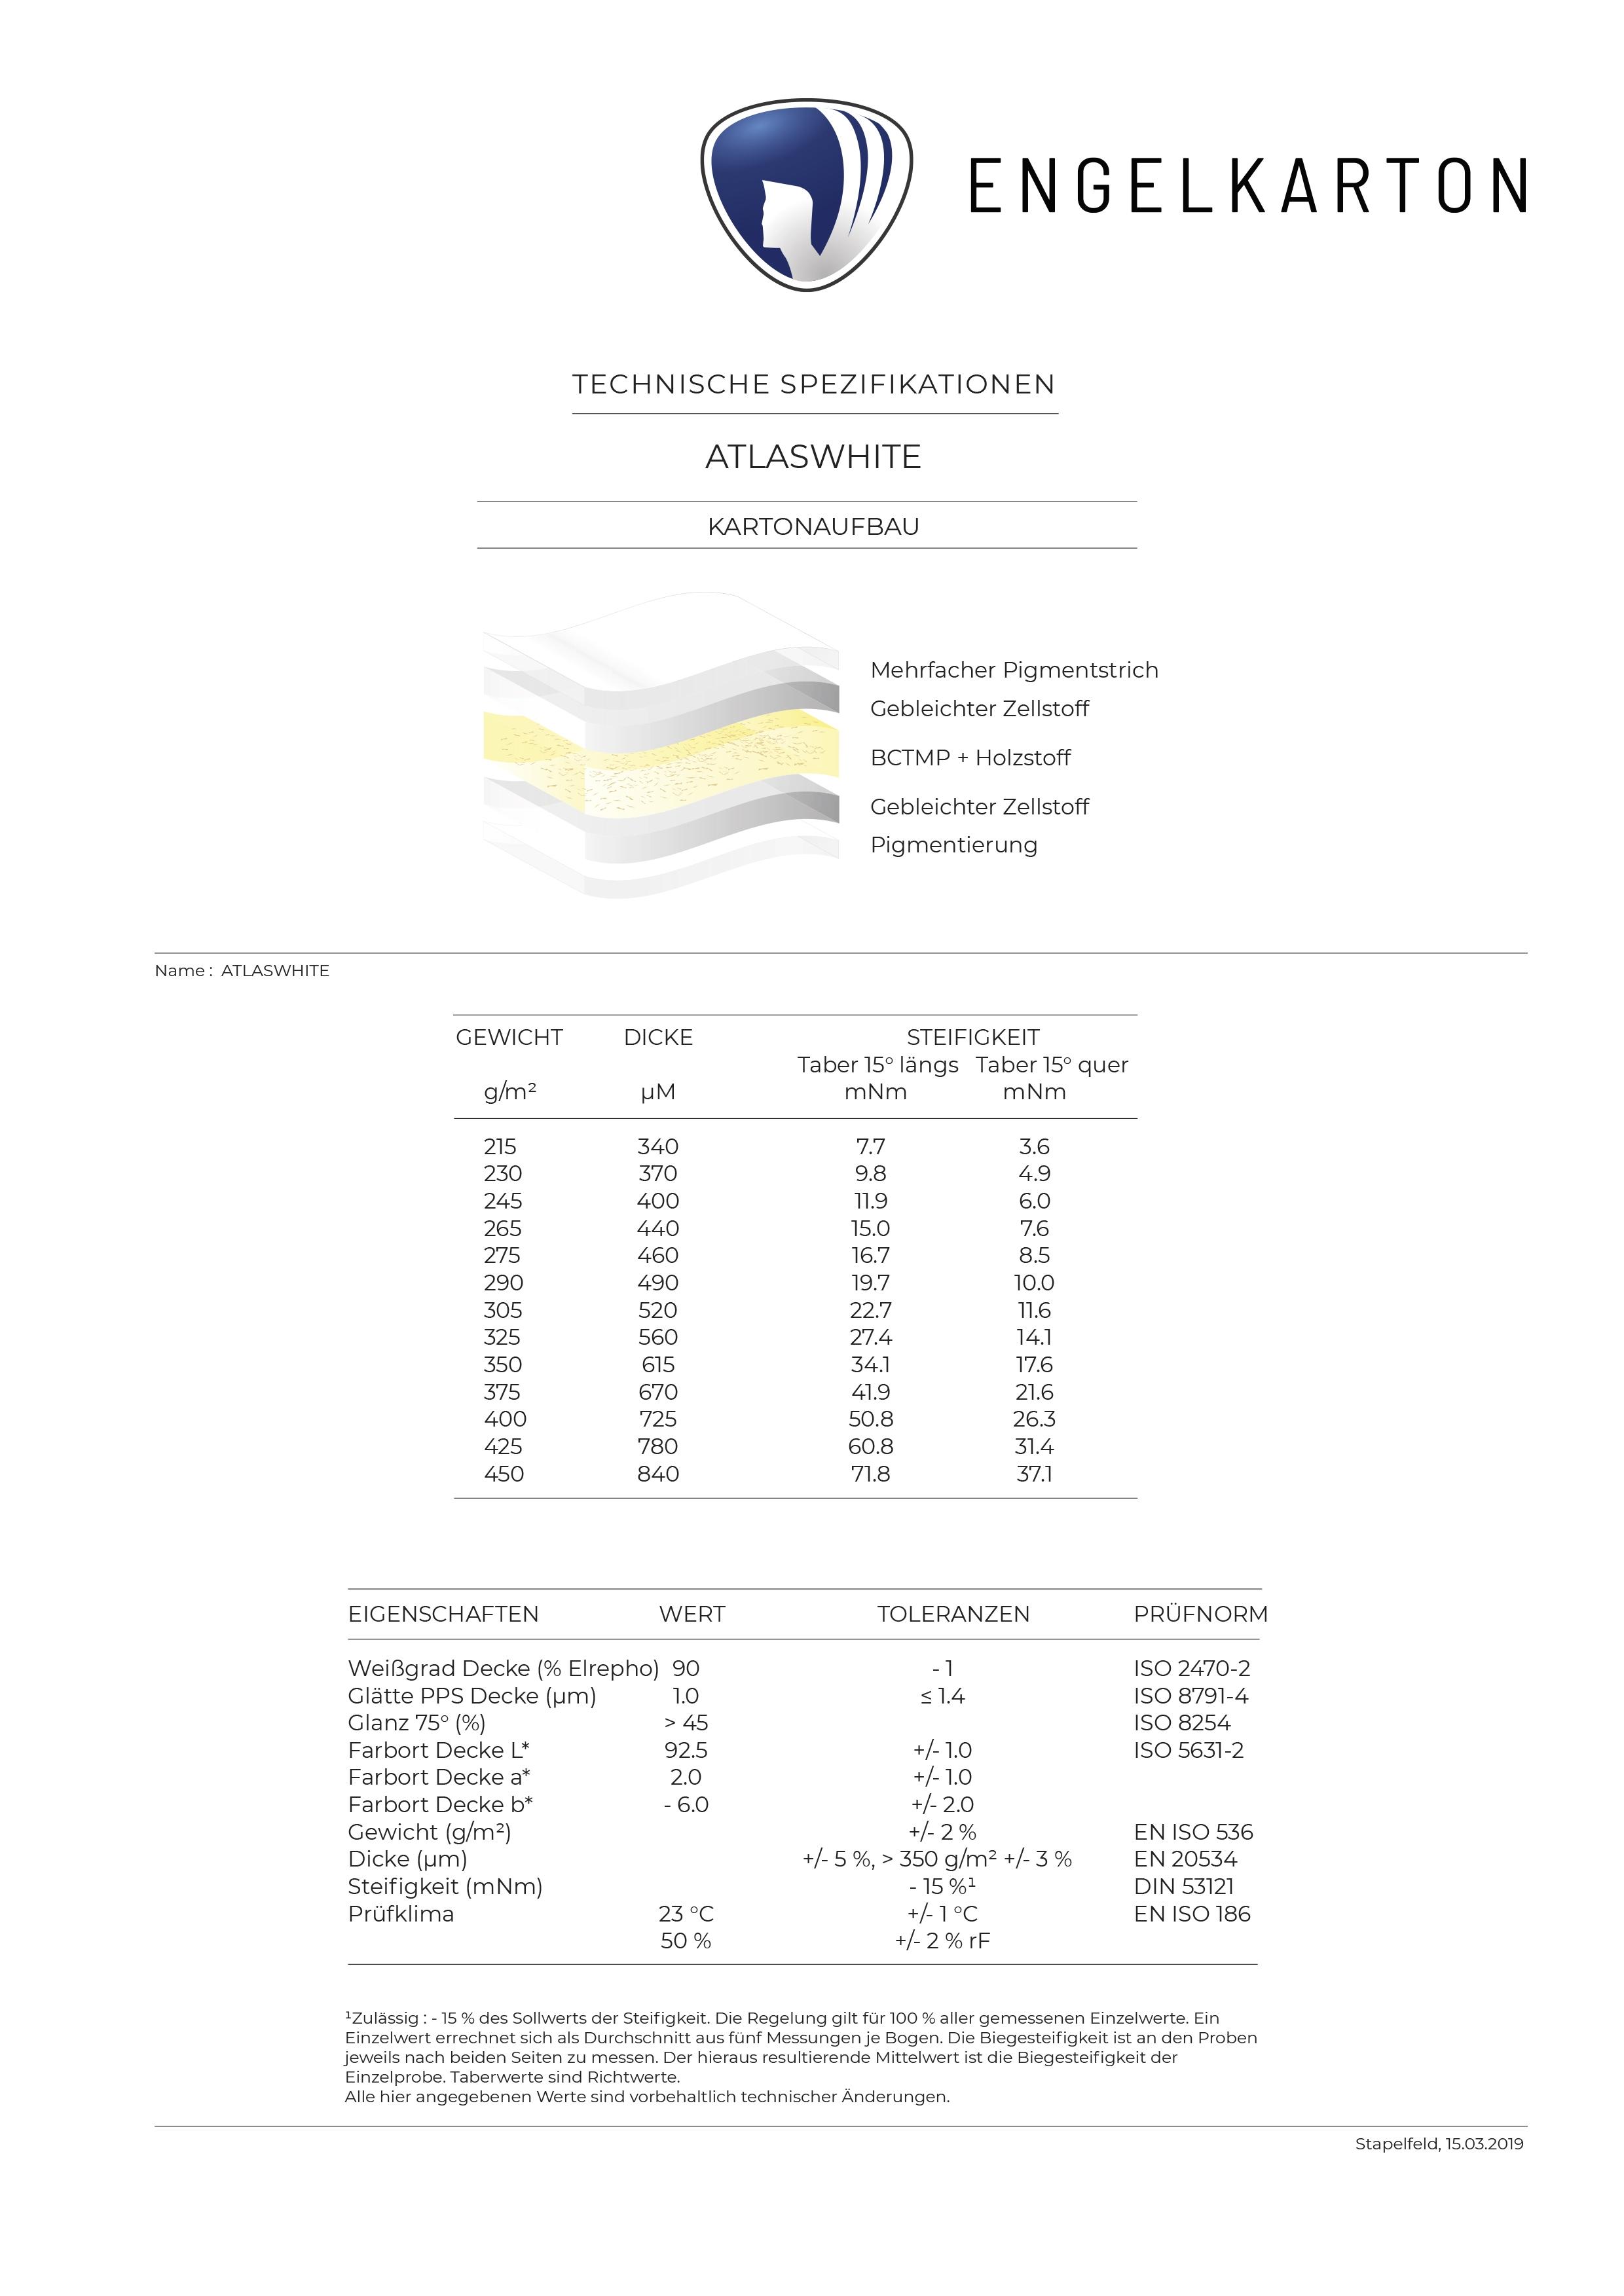 ATLASWHITE_web